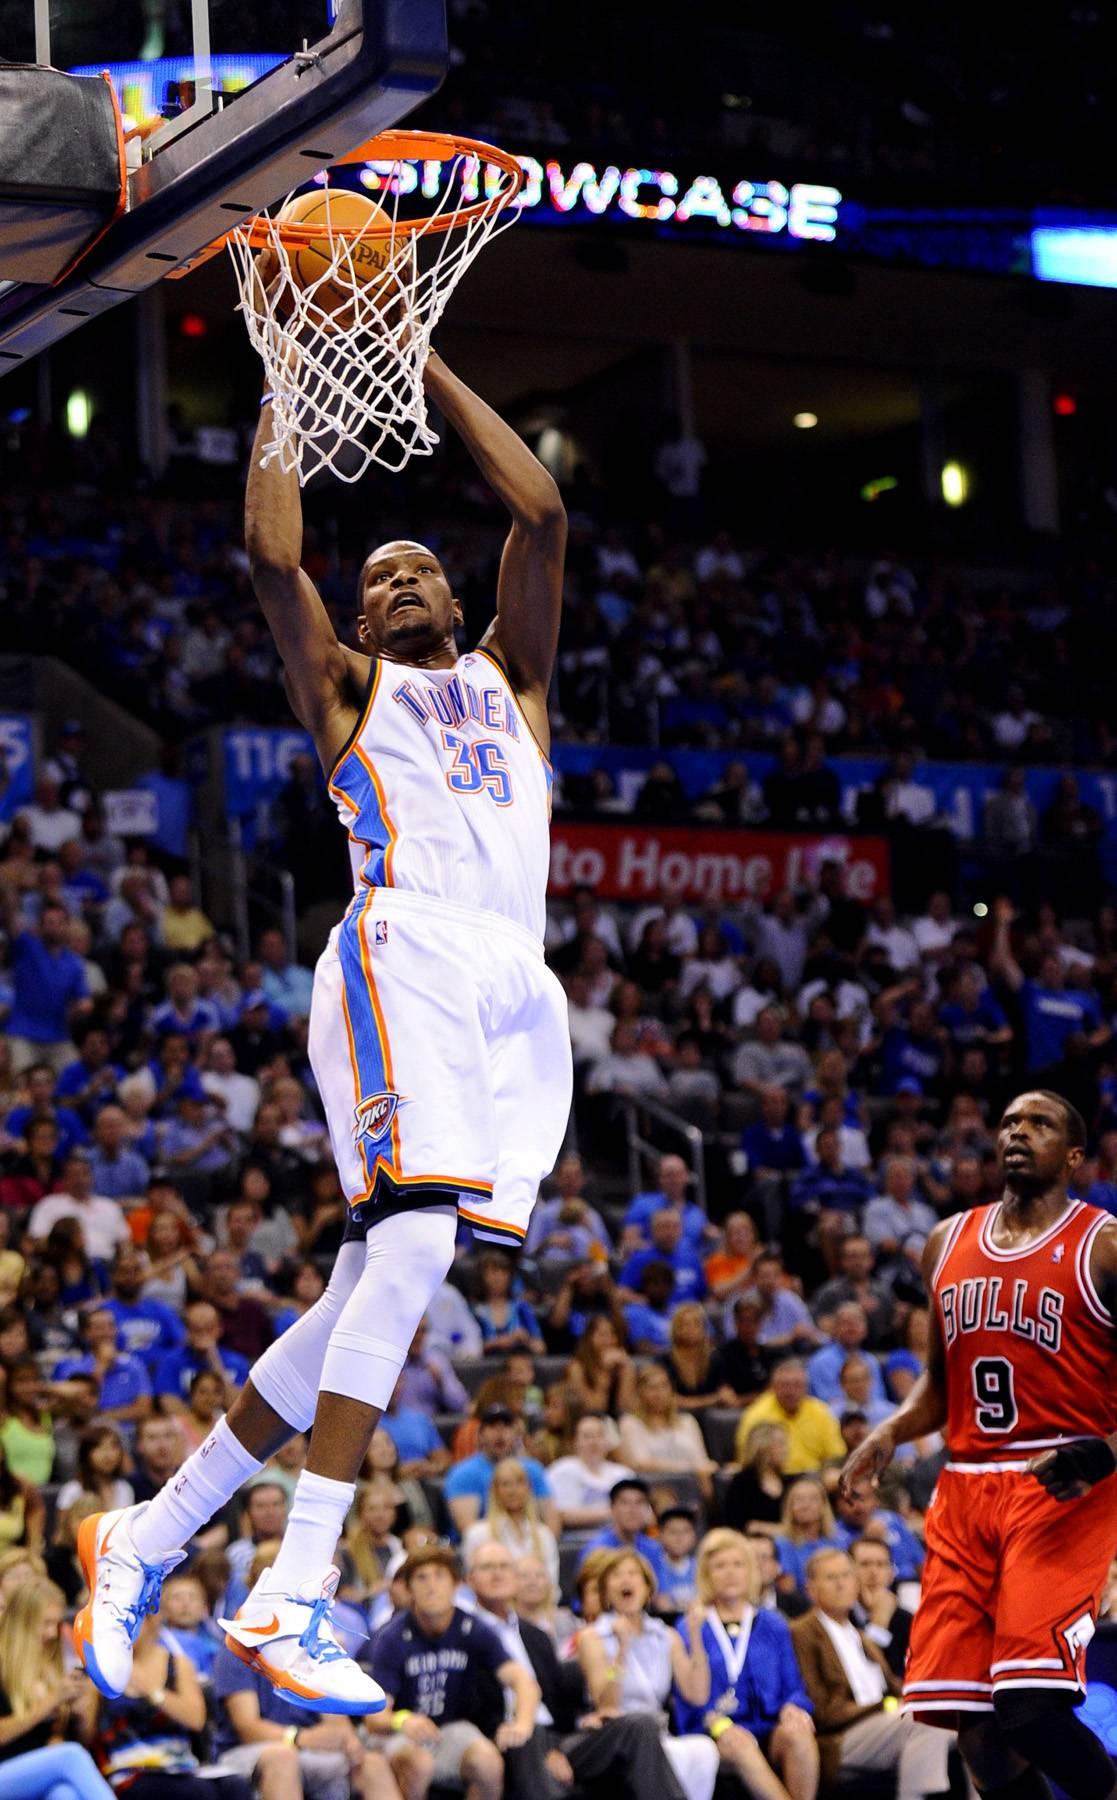 Kevin Durant - Men's basketball. NBA team: Oklahoma City Thunder.(Photo: EPA/LARRY W. SMITH/Landov)